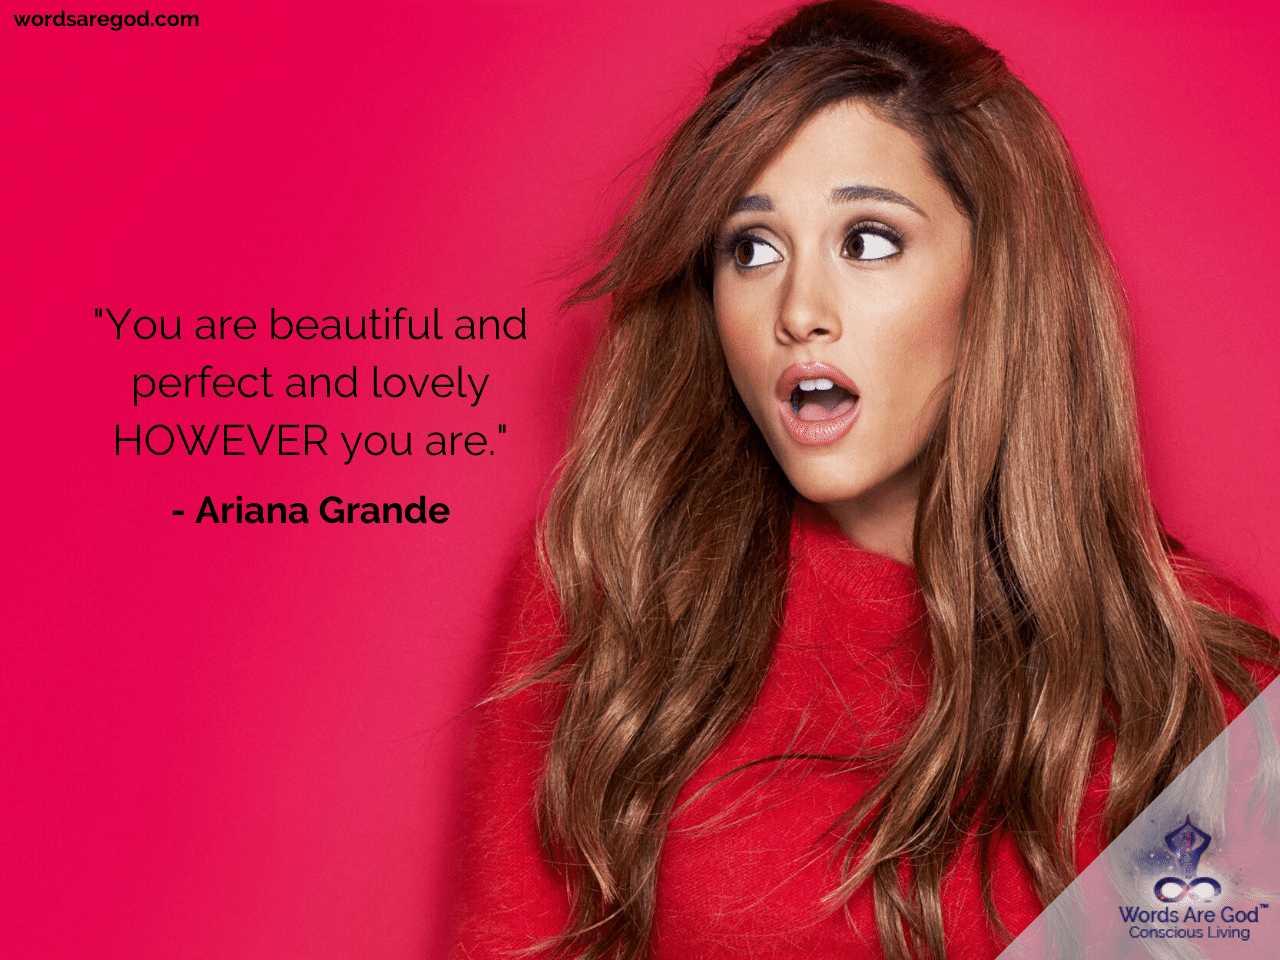 Ariana Grande Motivational Quote by Ariana Grande